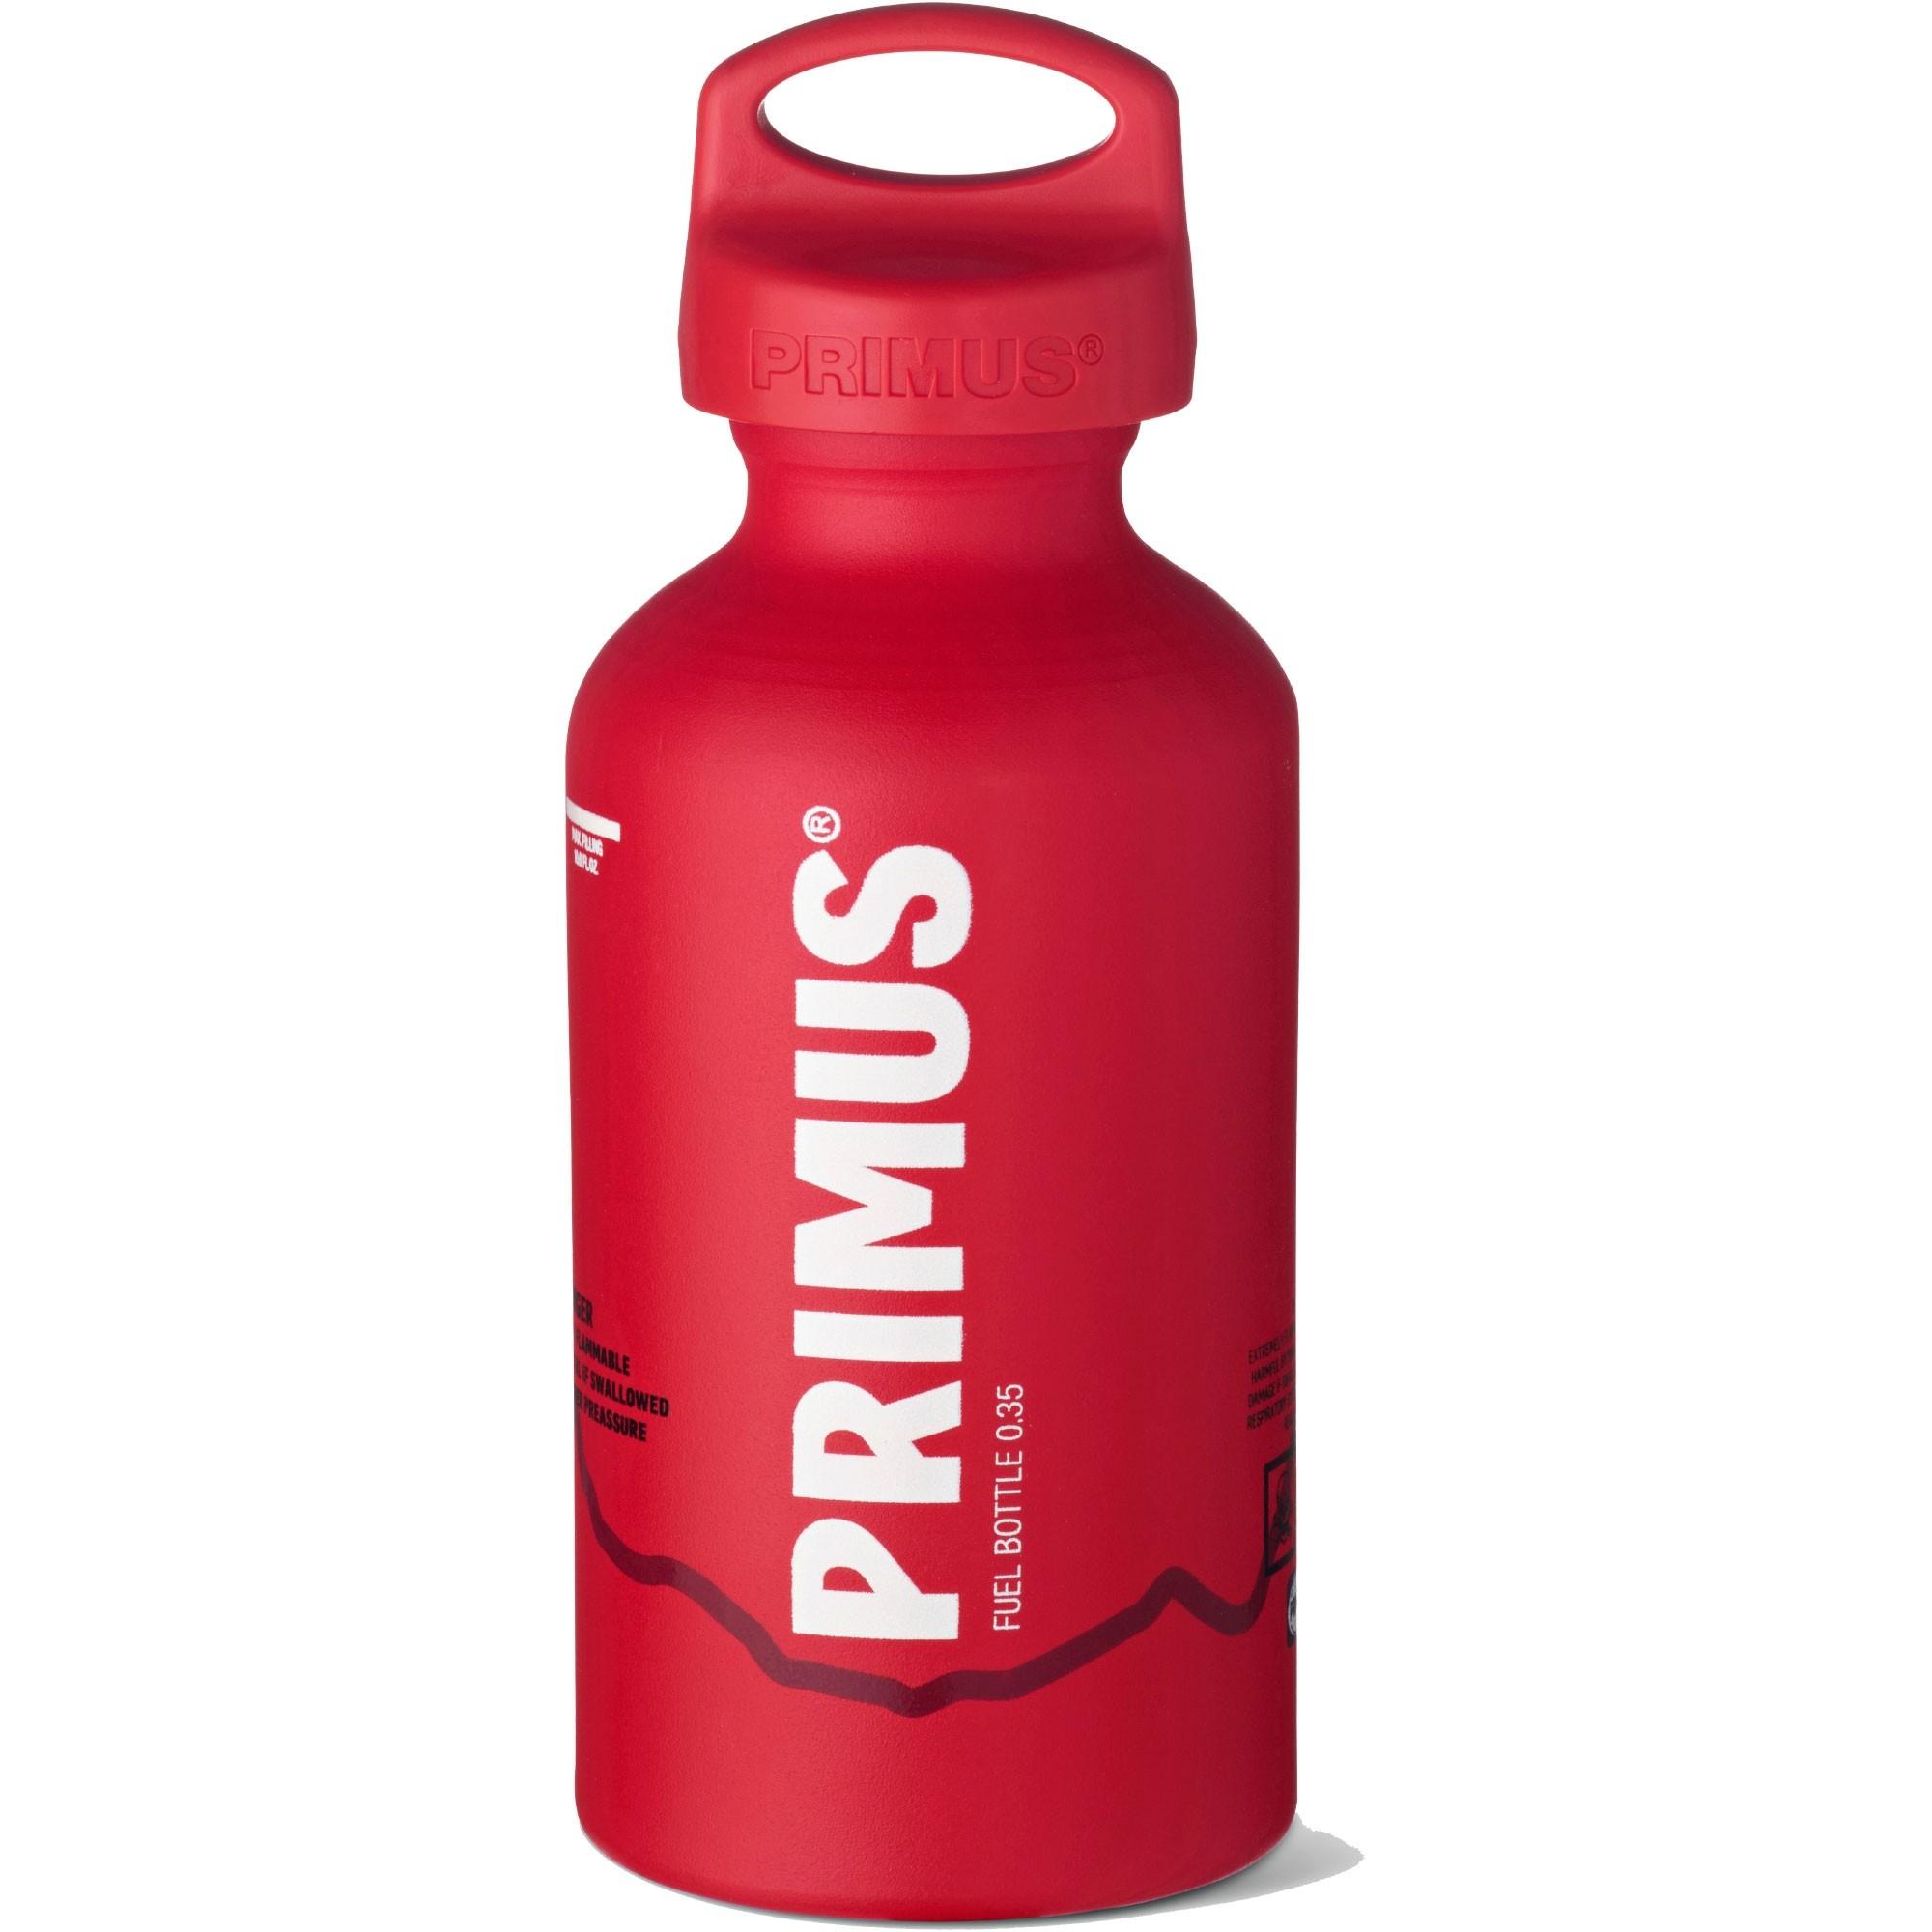 Primus Fuel Bottle with Child-Proof Cap - 0.35L